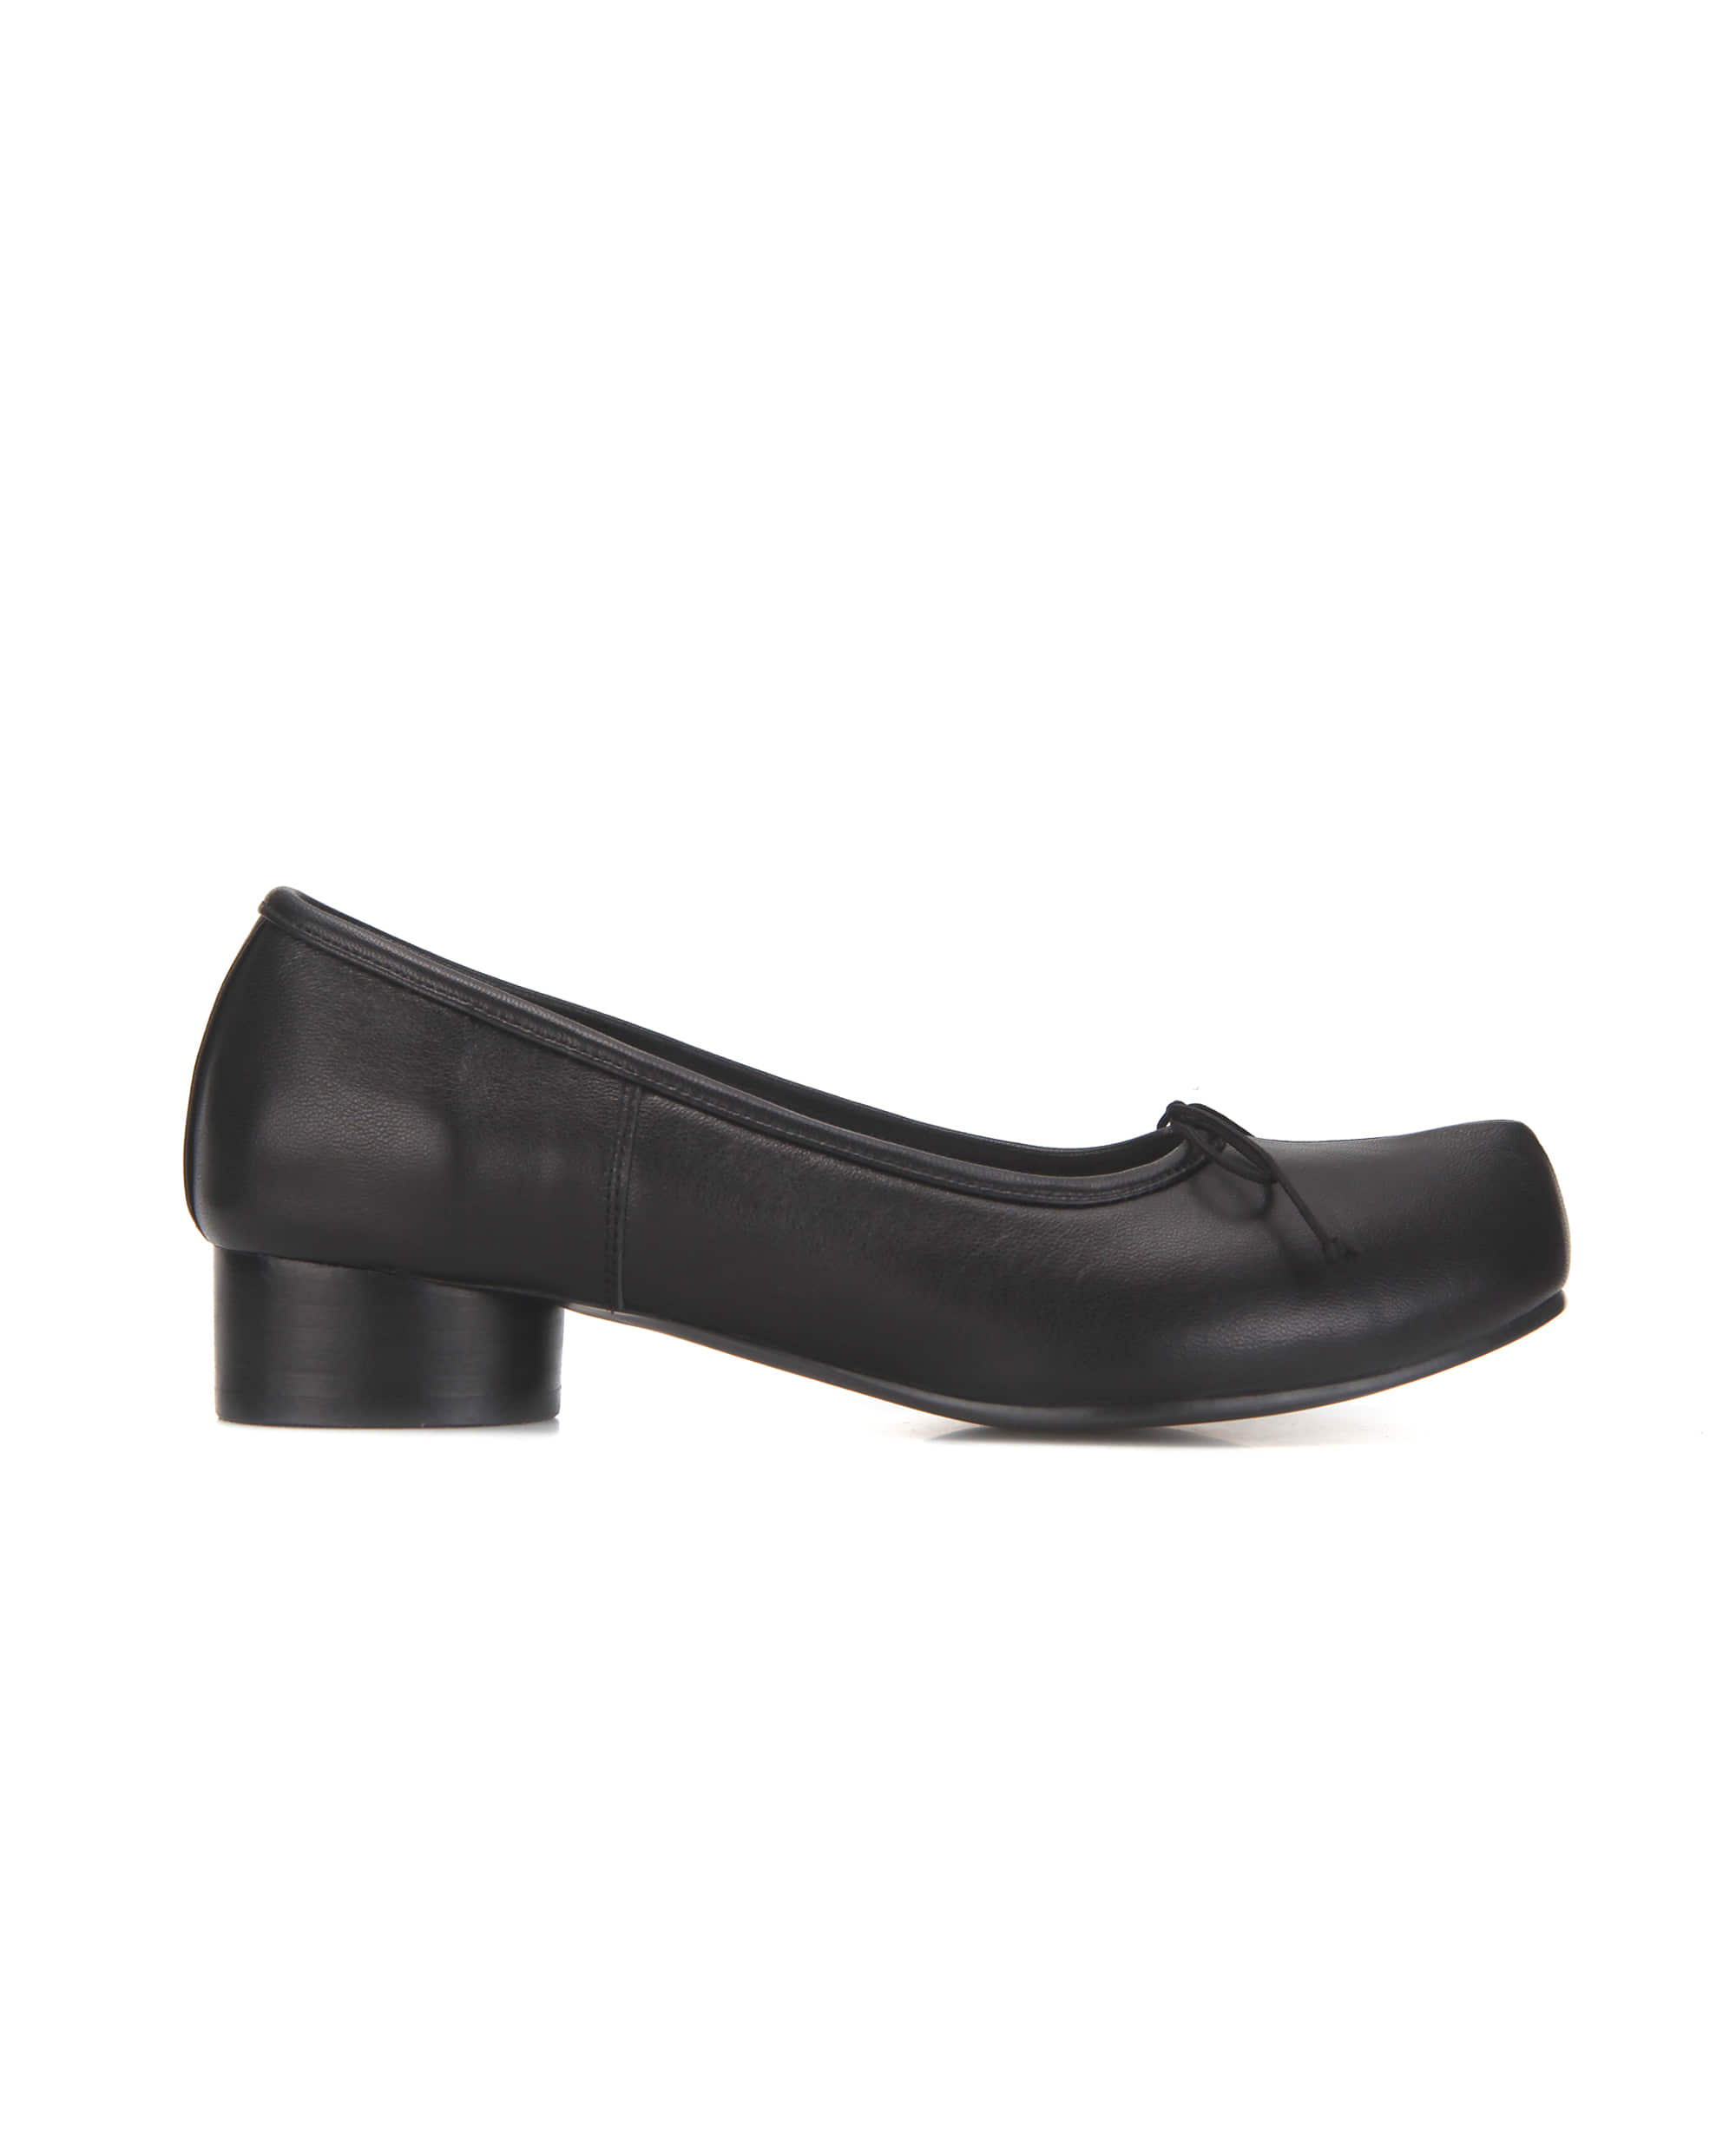 Pointed toe ballerina pumps | Black